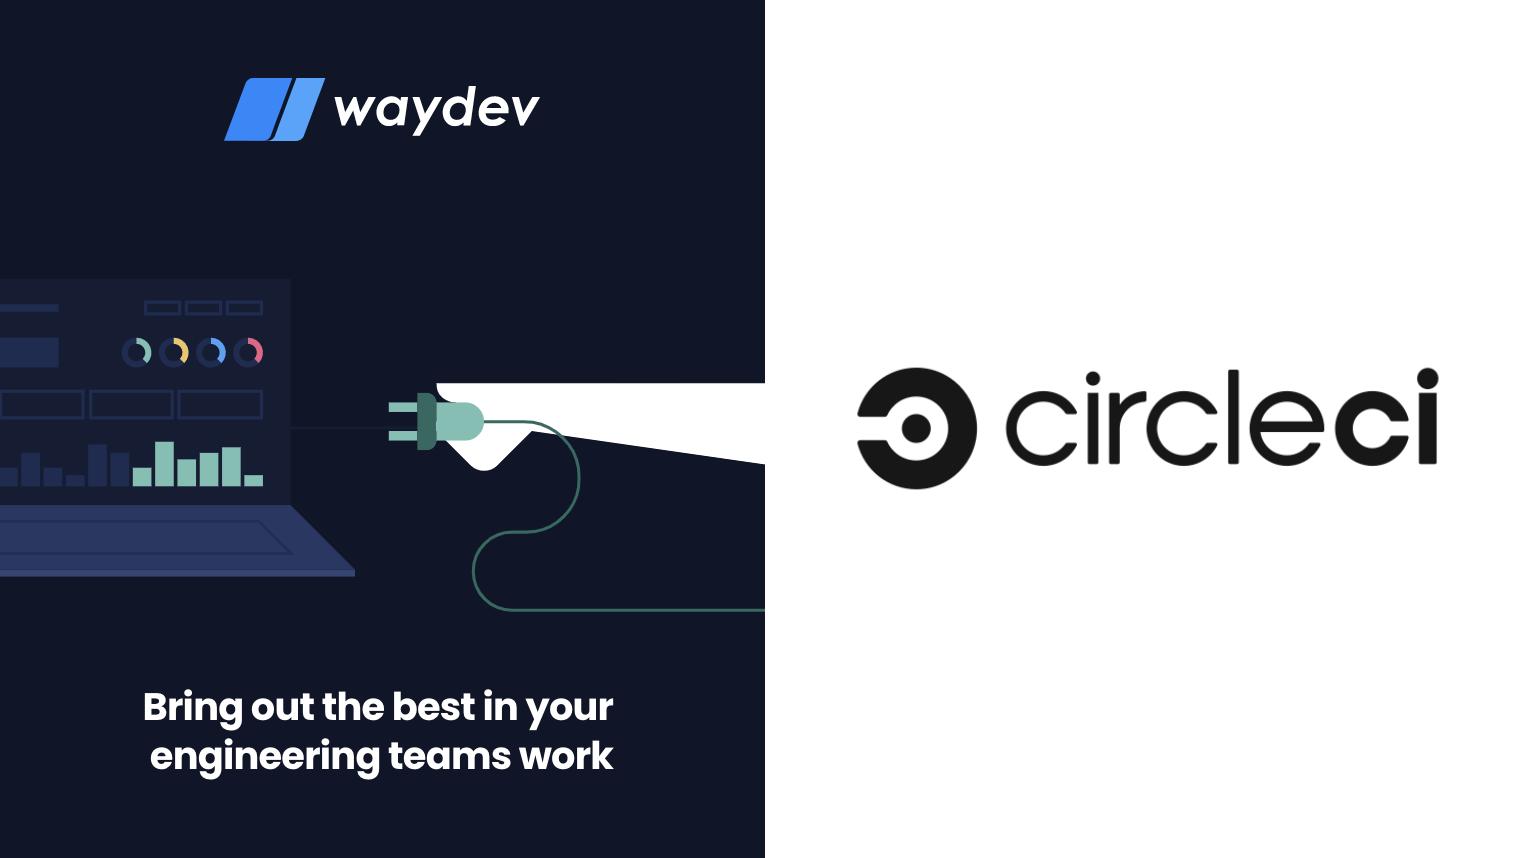 Waydev CircleCI